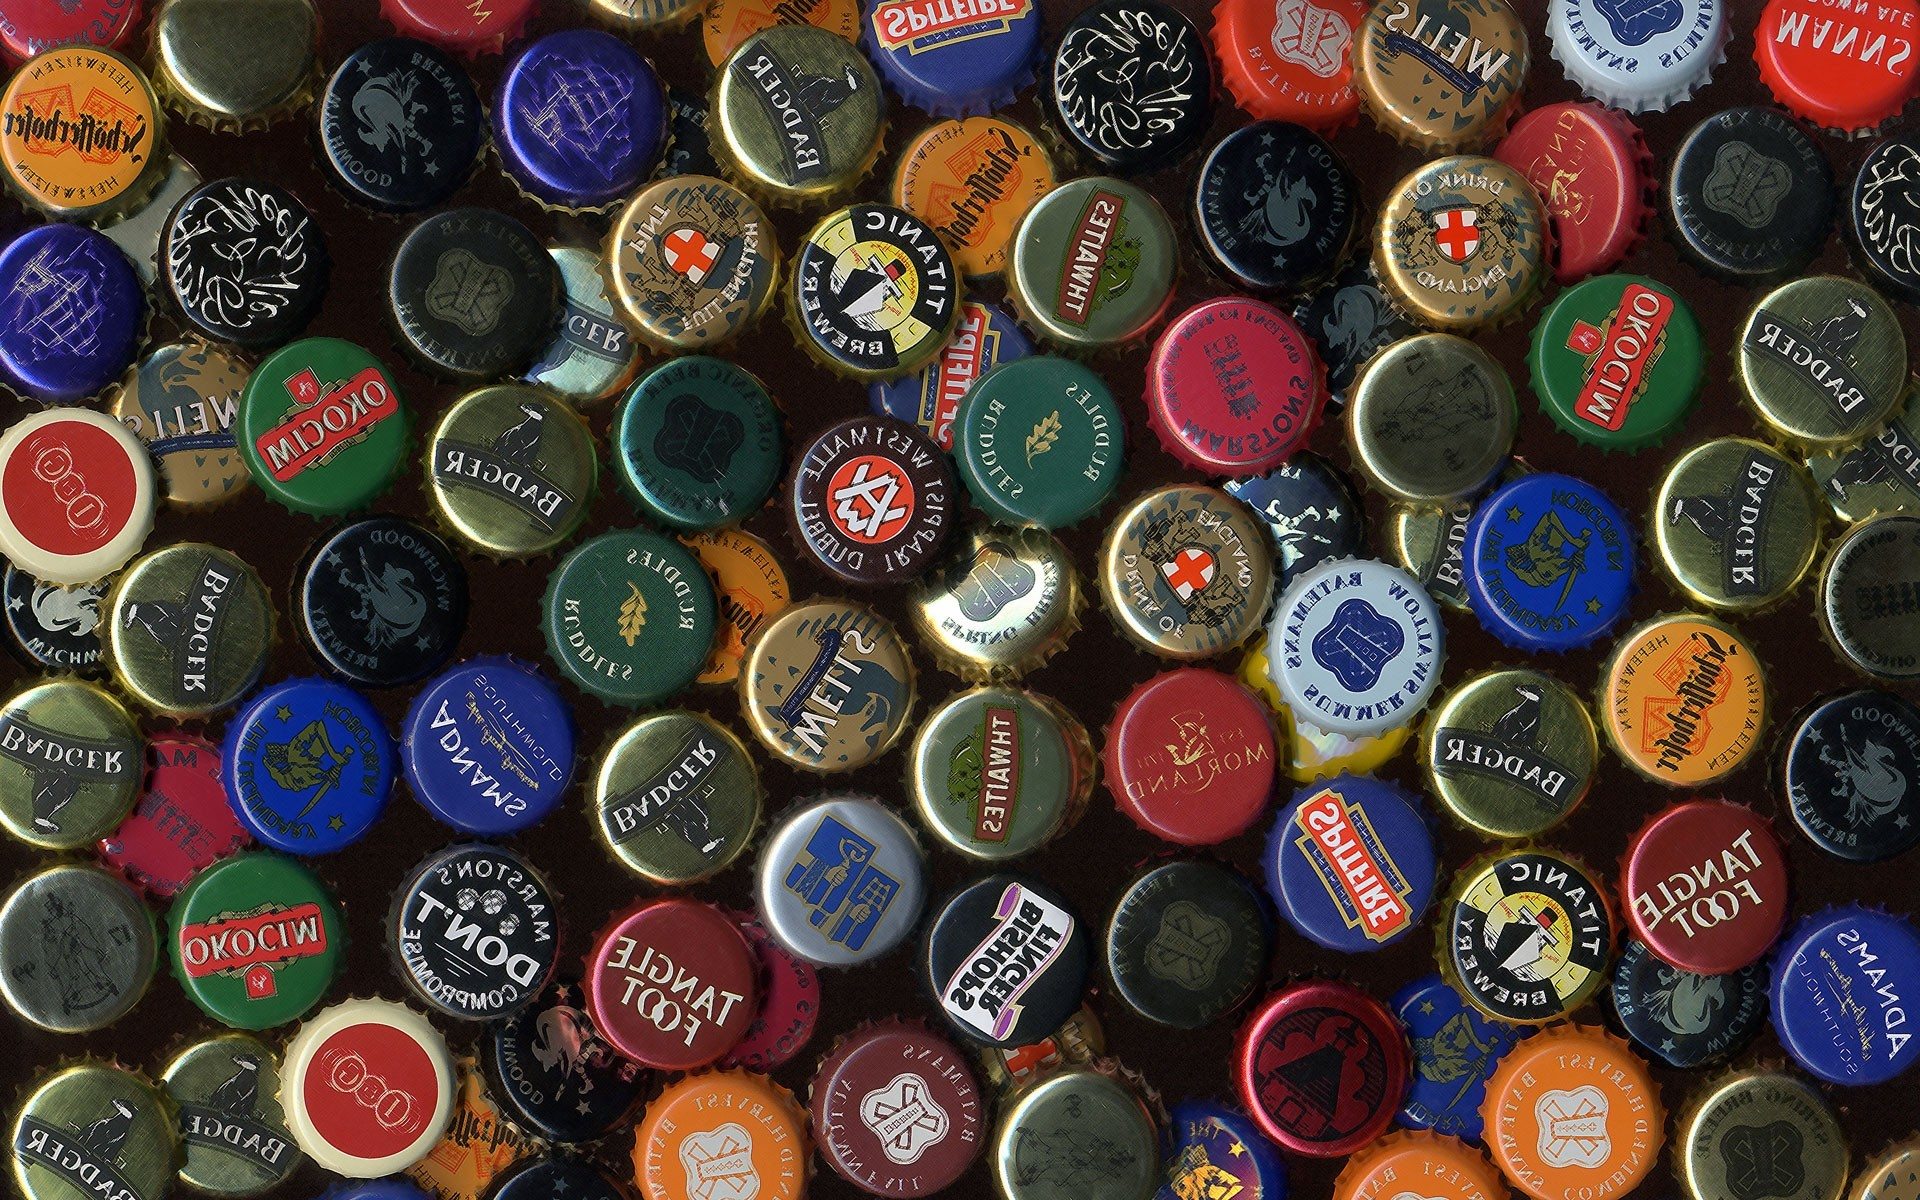 Beer Bottle Caps Pics, Misc Collection